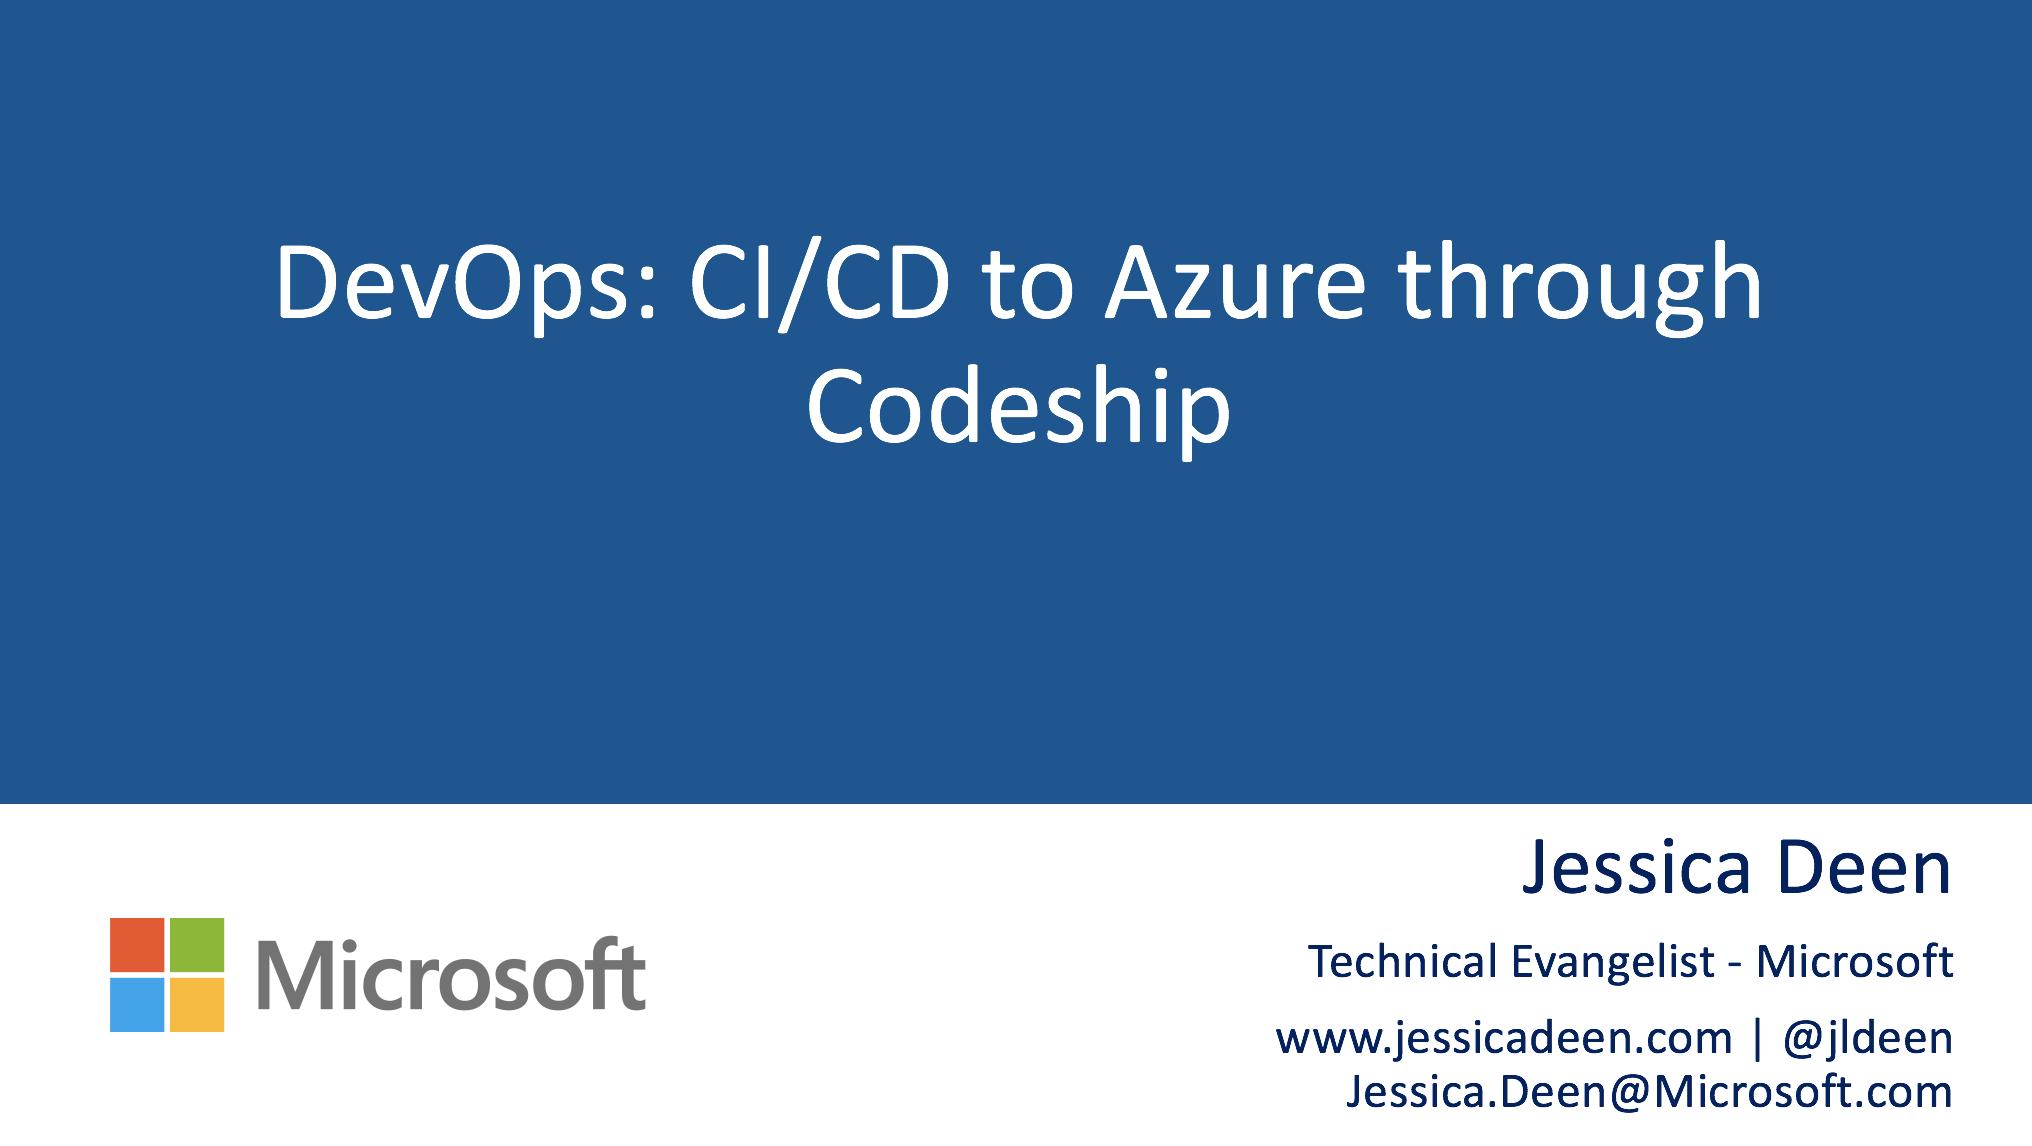 Linuxfest Northwest Deck: DevOps: CI/CD to Azure through Codeship